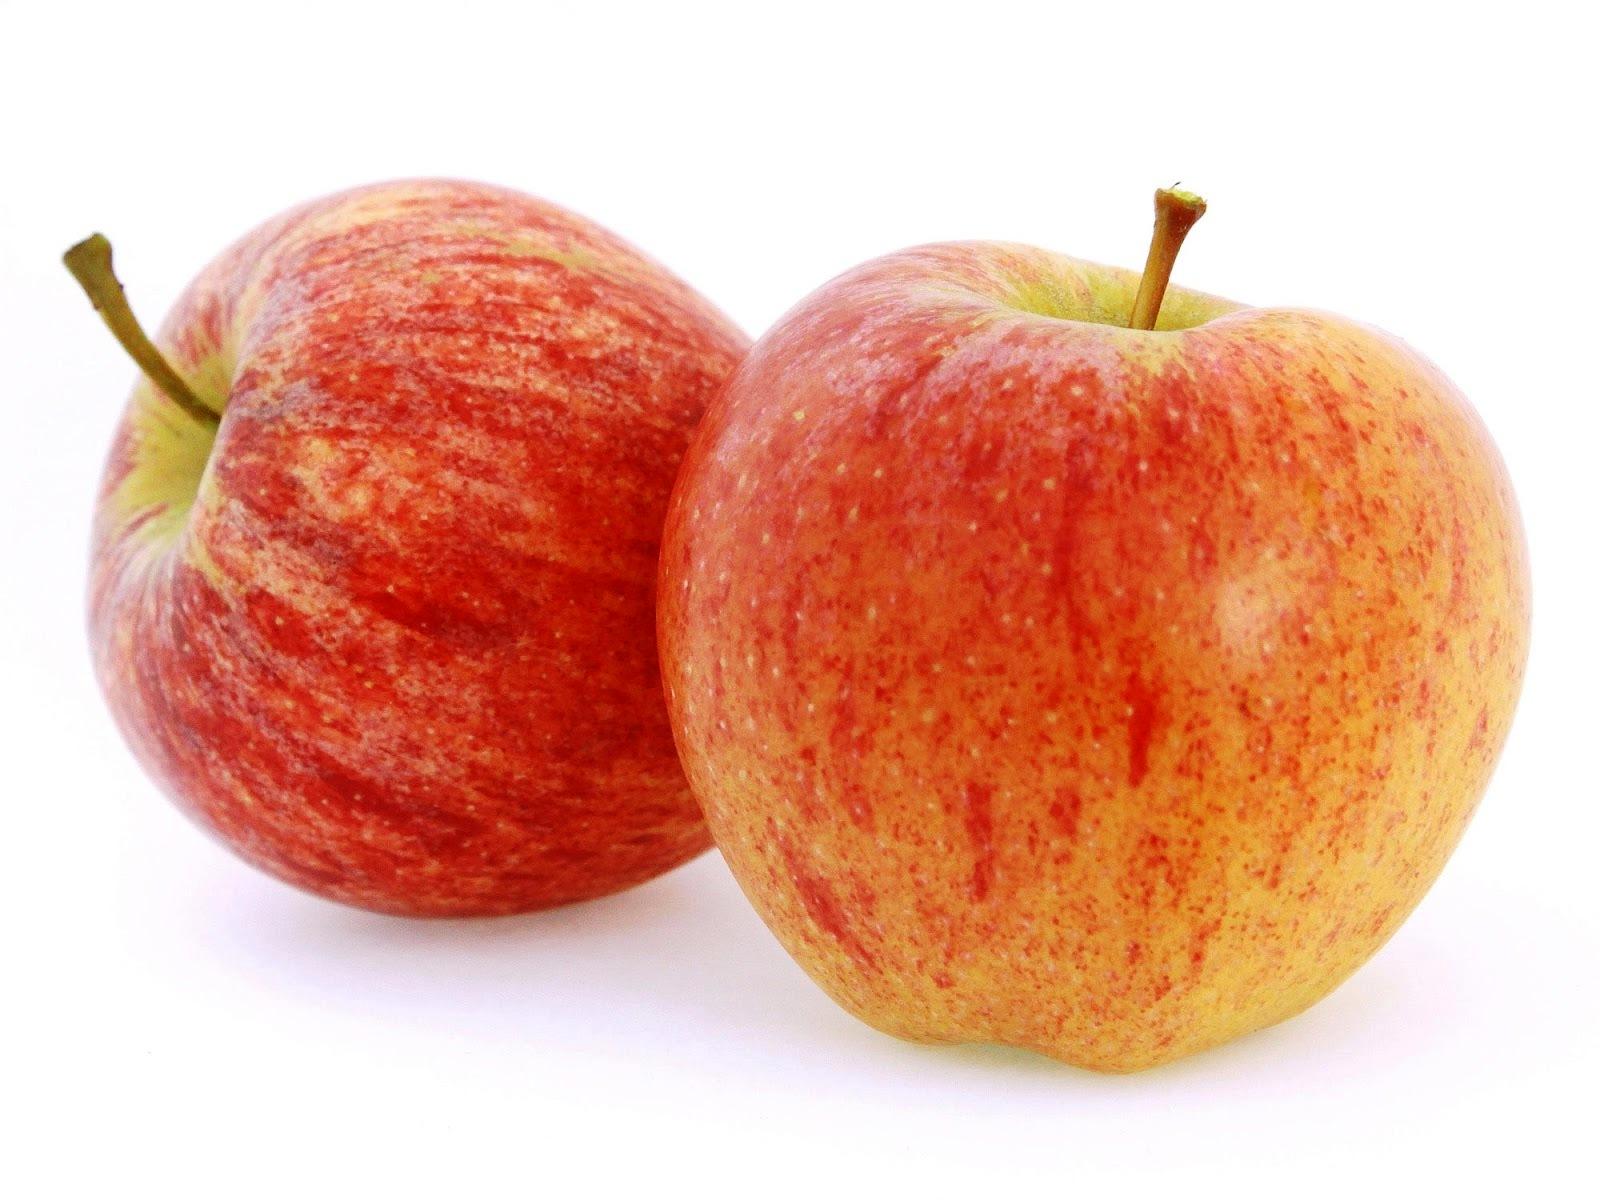 Http Www Grosvenormarket Com Blog Tag Apples